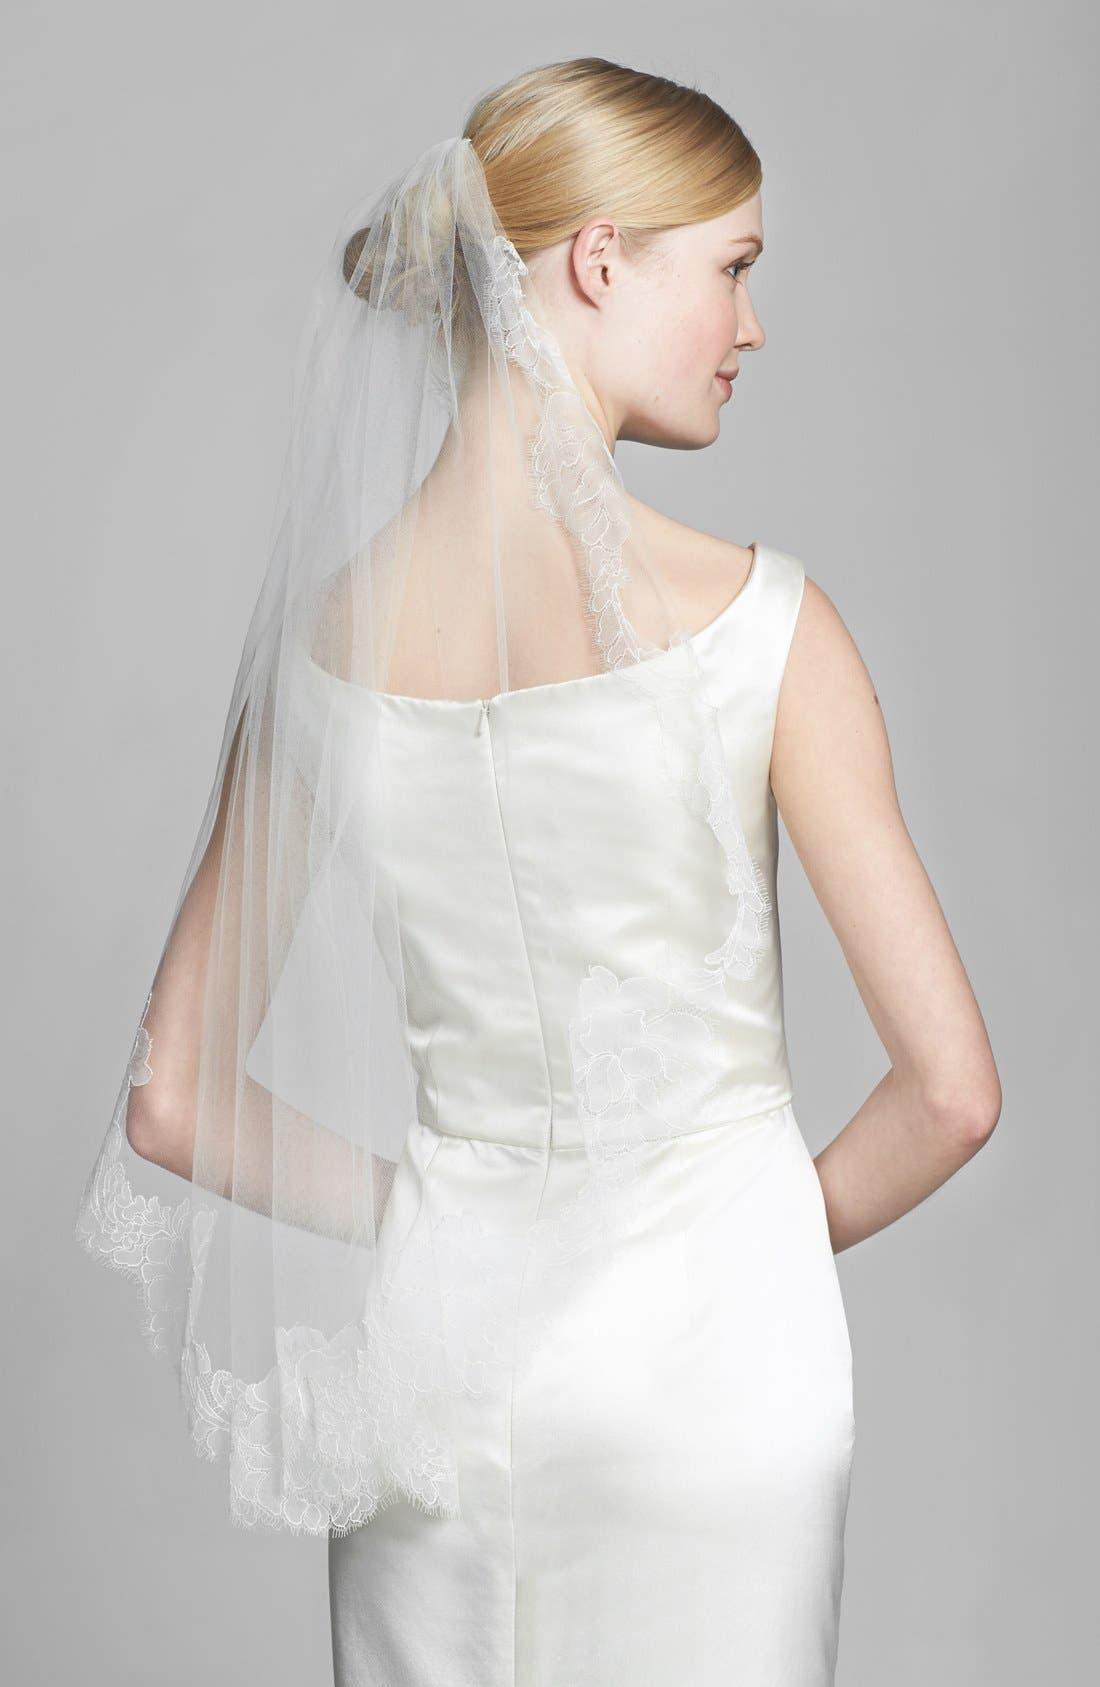 Main Image - Veil Trends 'Alexa' Chantilly Lace Veil